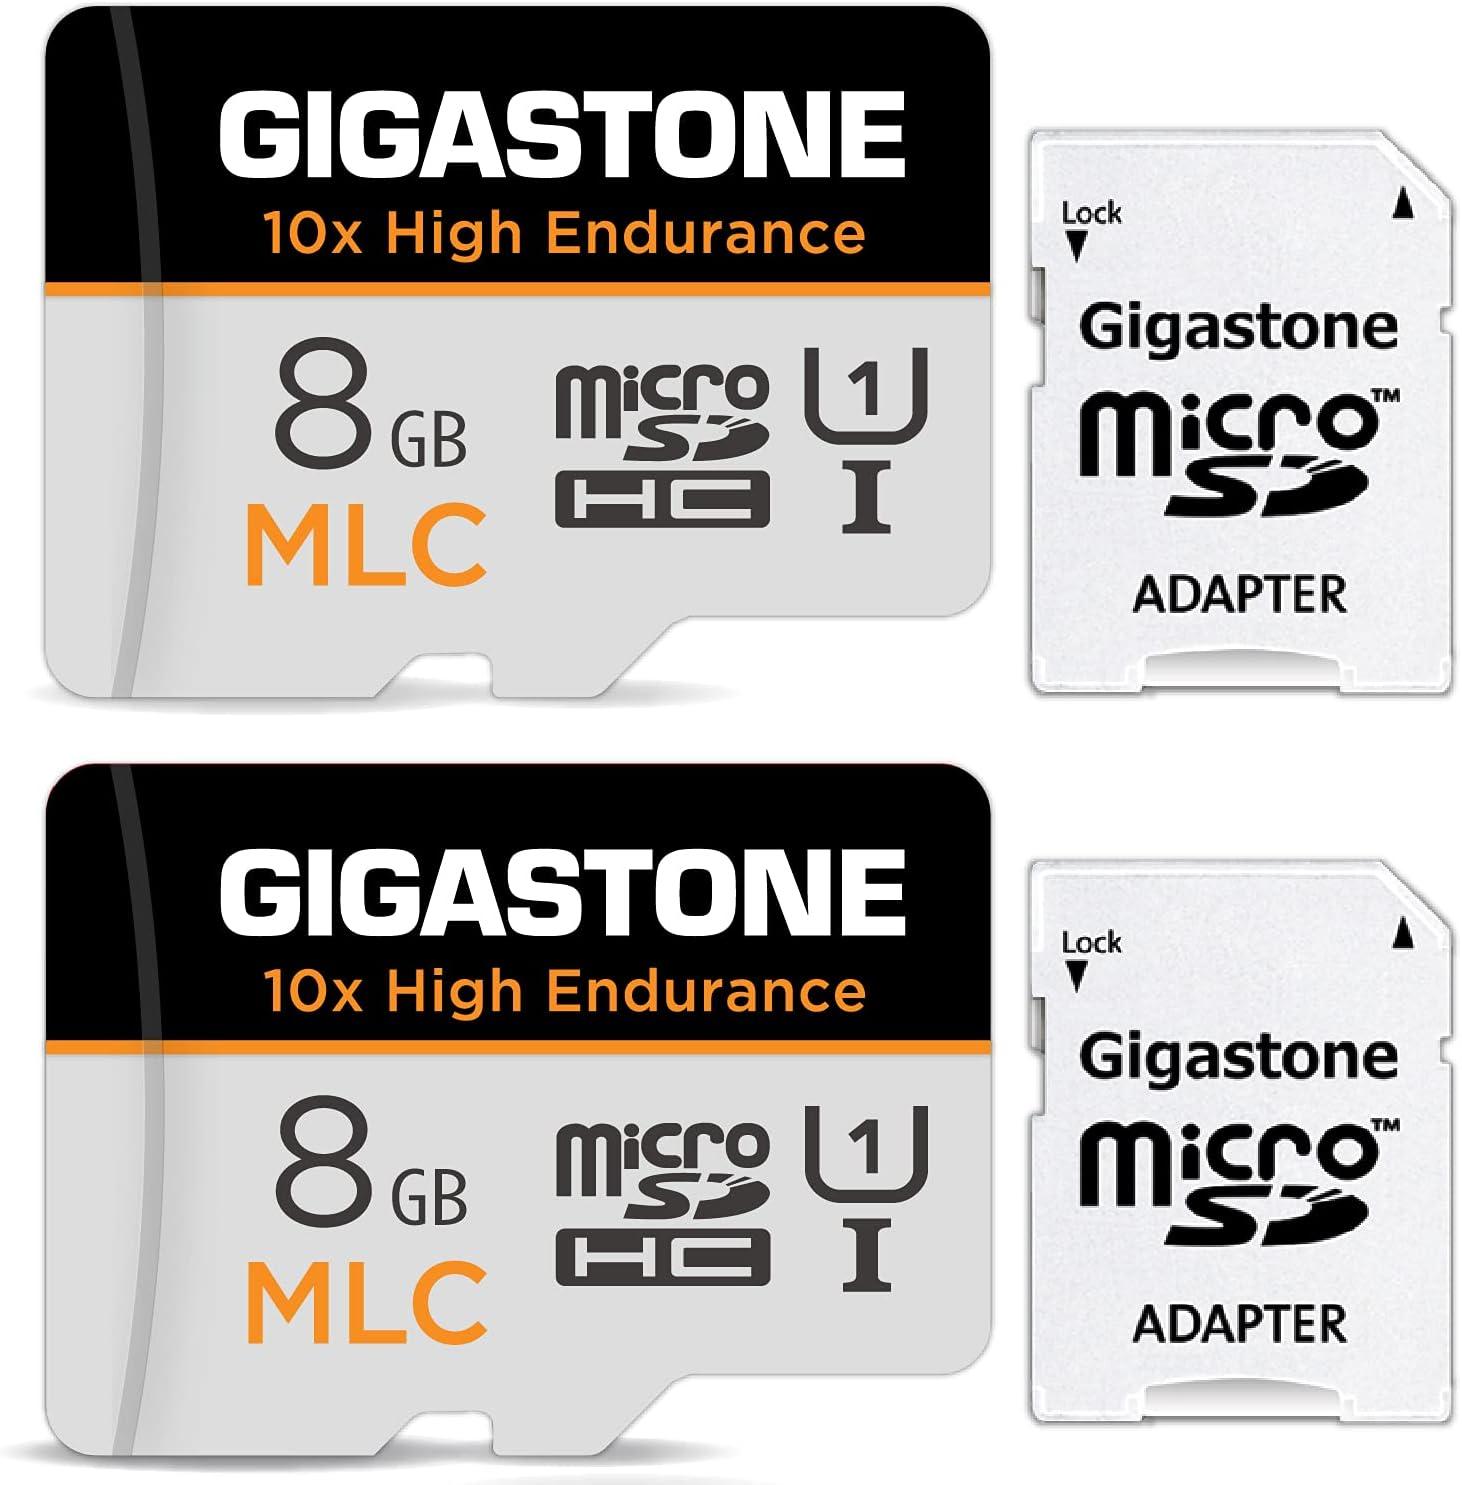 Gigastone 8GB 2-Pack MLC Micro SD Card, 10x High Endurance Full HD Video Recording, Security Cam, Dash Cam, Surveillance Compatible 85MB/s, U1 C10 Micro SD MLC (MLC 8GB 2-Pack)